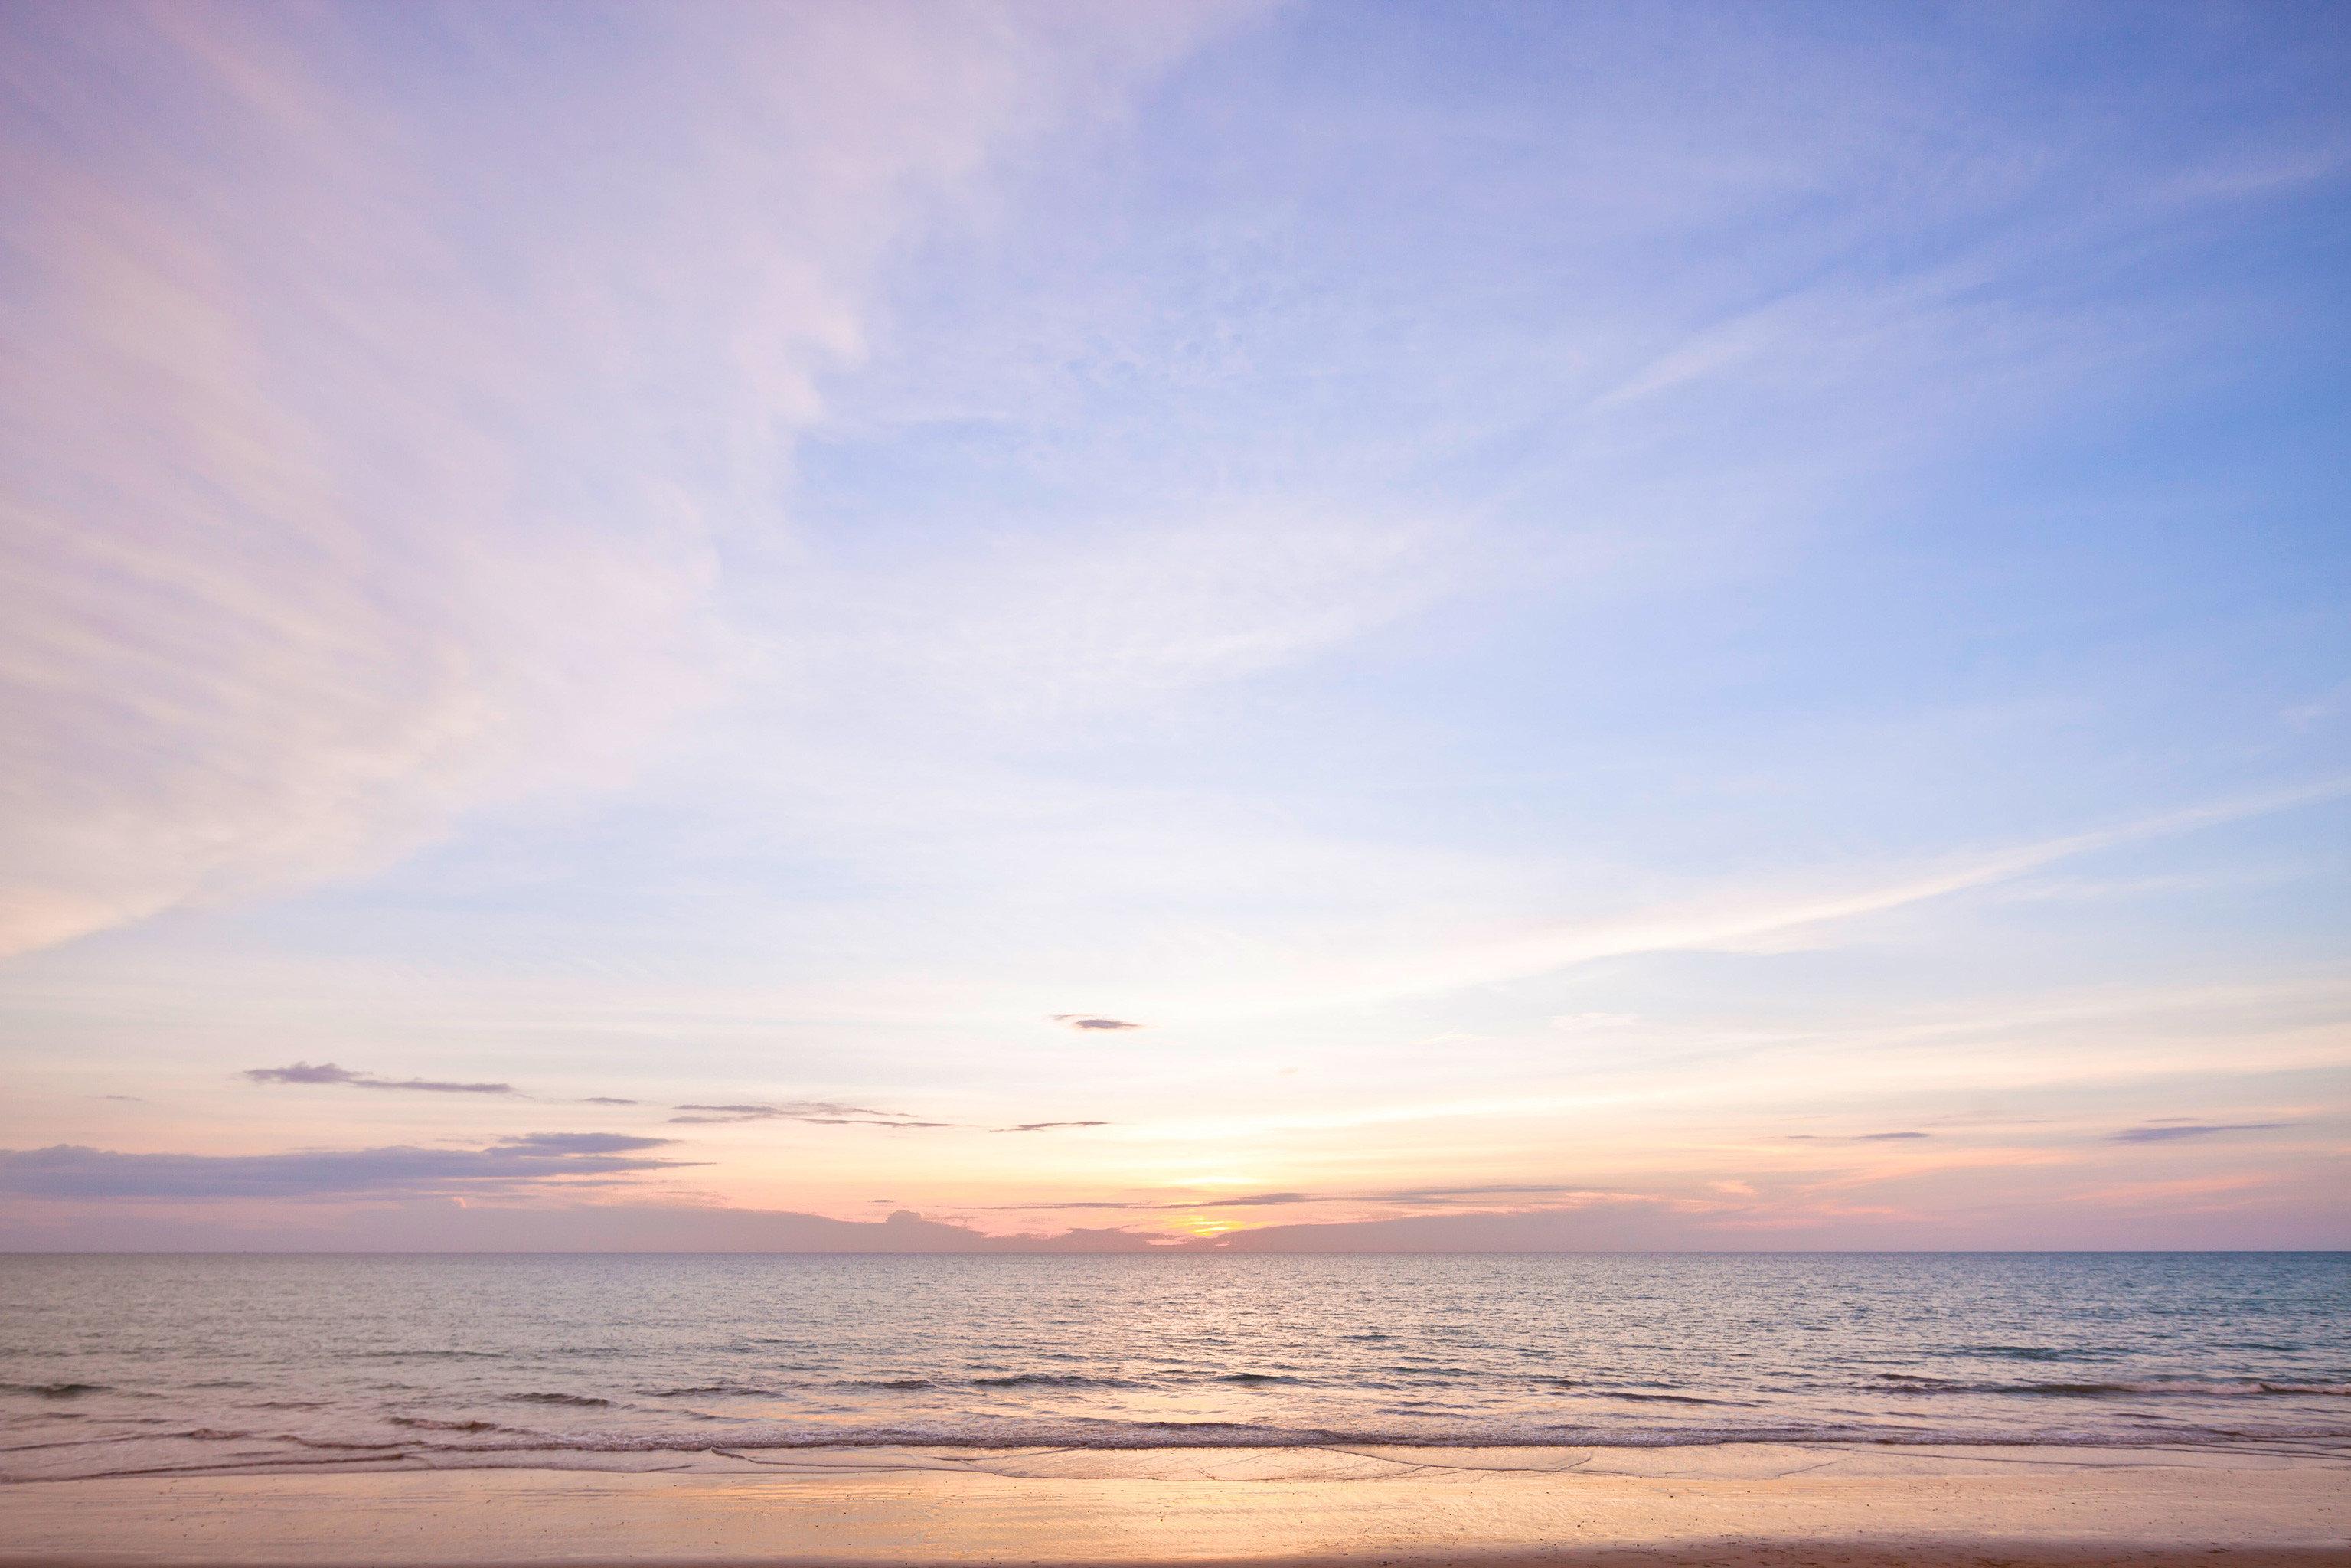 Beachfront Modern Romantic Scenic views sky water horizon Beach Sea cloud Ocean Sunset afterglow Nature sunrise dawn shore Coast morning dusk wind wave evening sunlight wave sandy